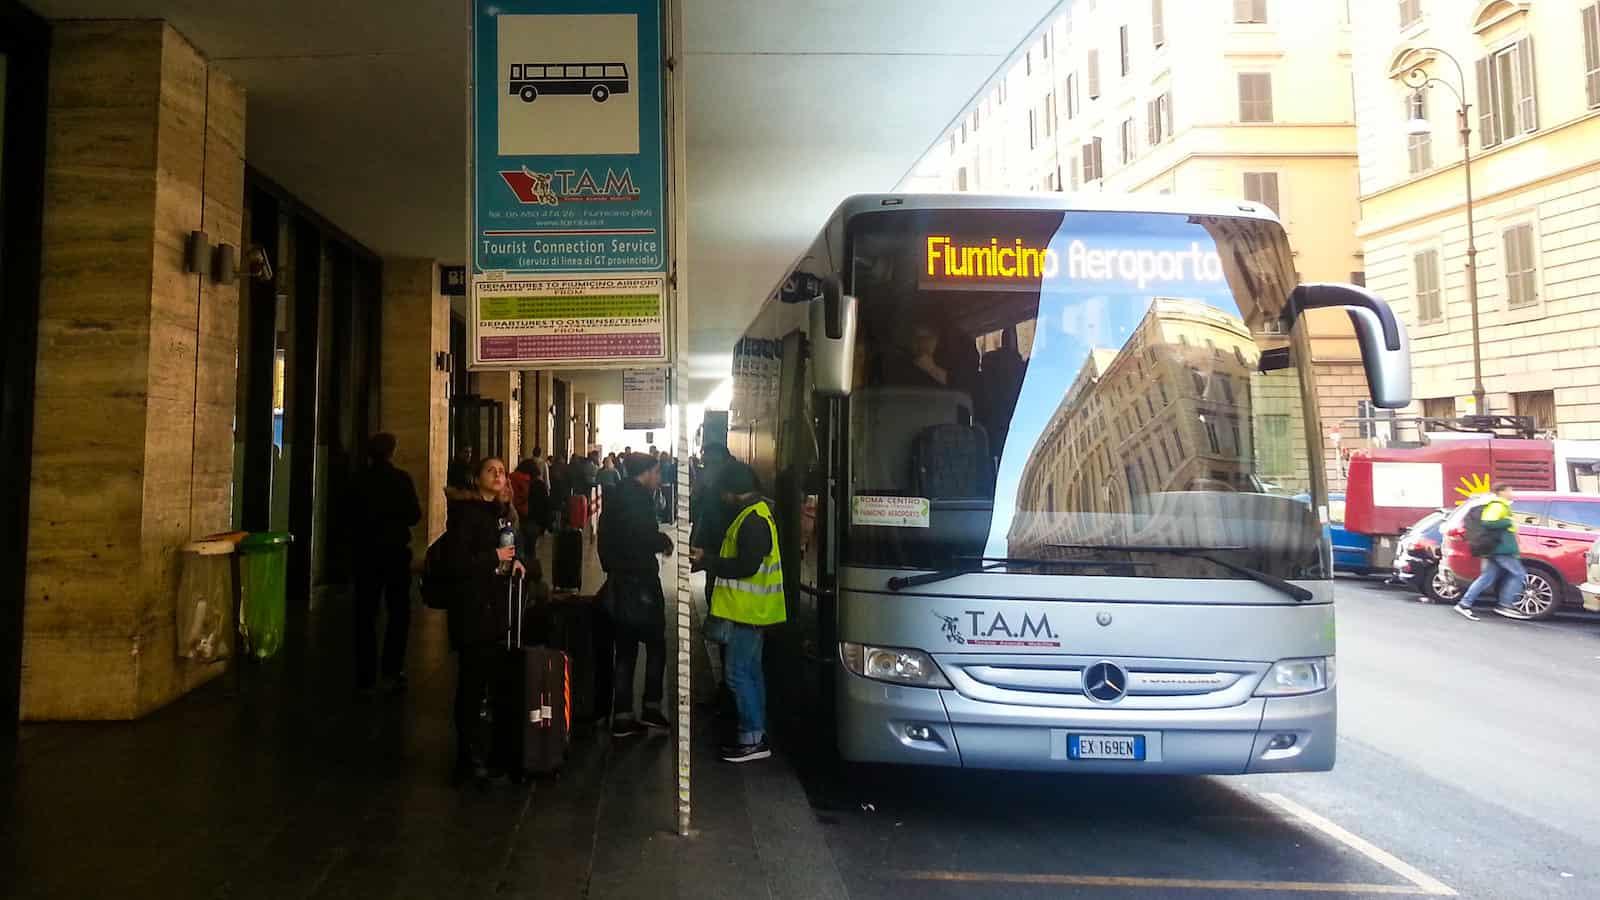 T.A.M bus